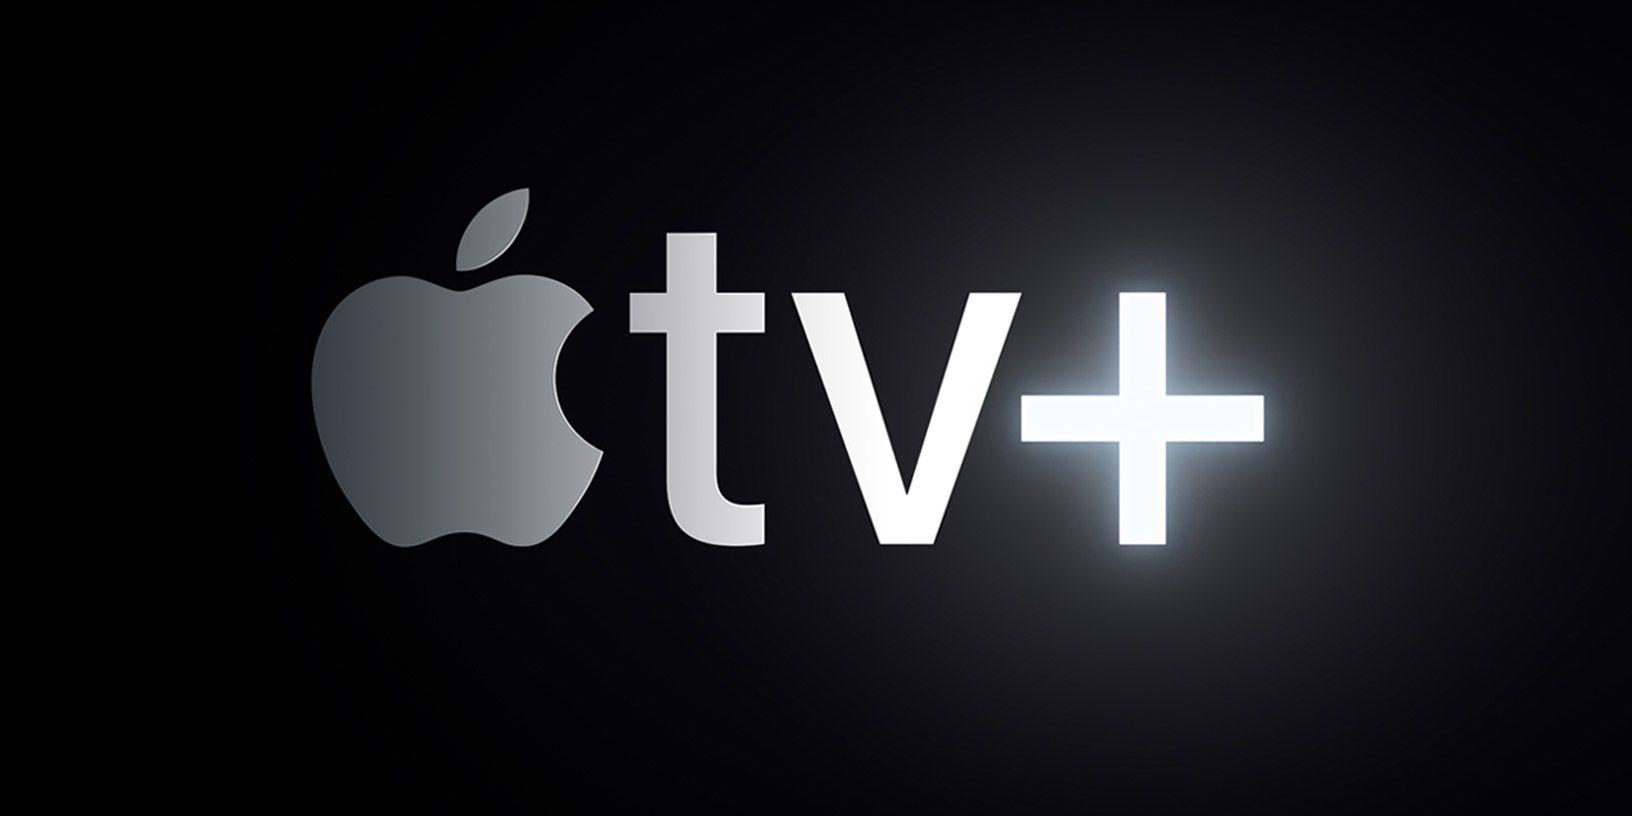 Apple TV+: Will Apple's TV streaming service rival Netflix?